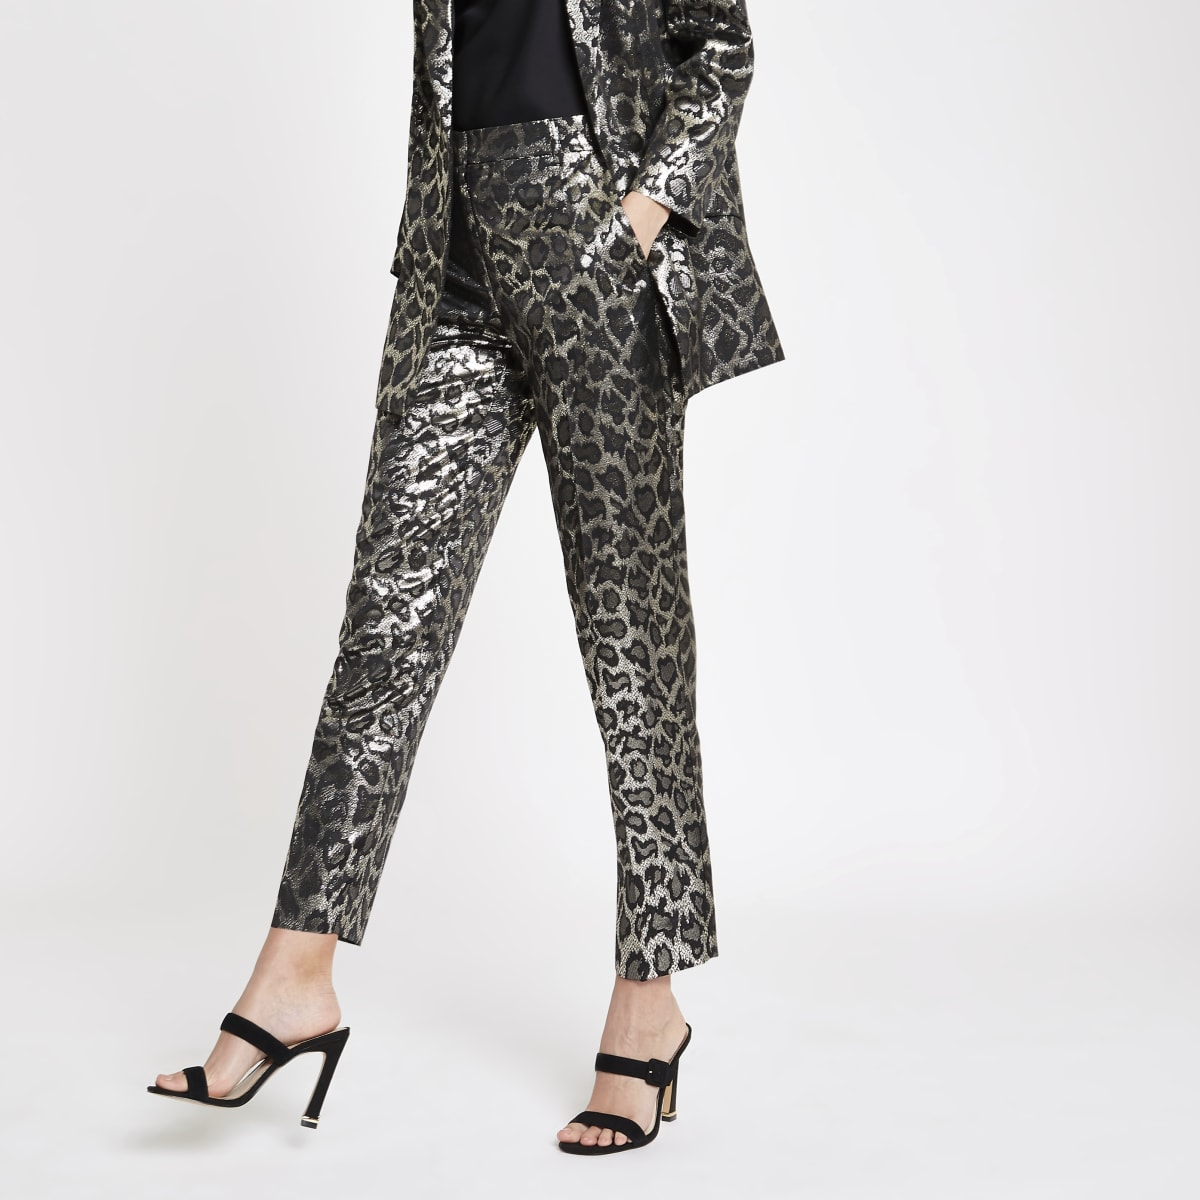 Black leopard print jacquard trousers